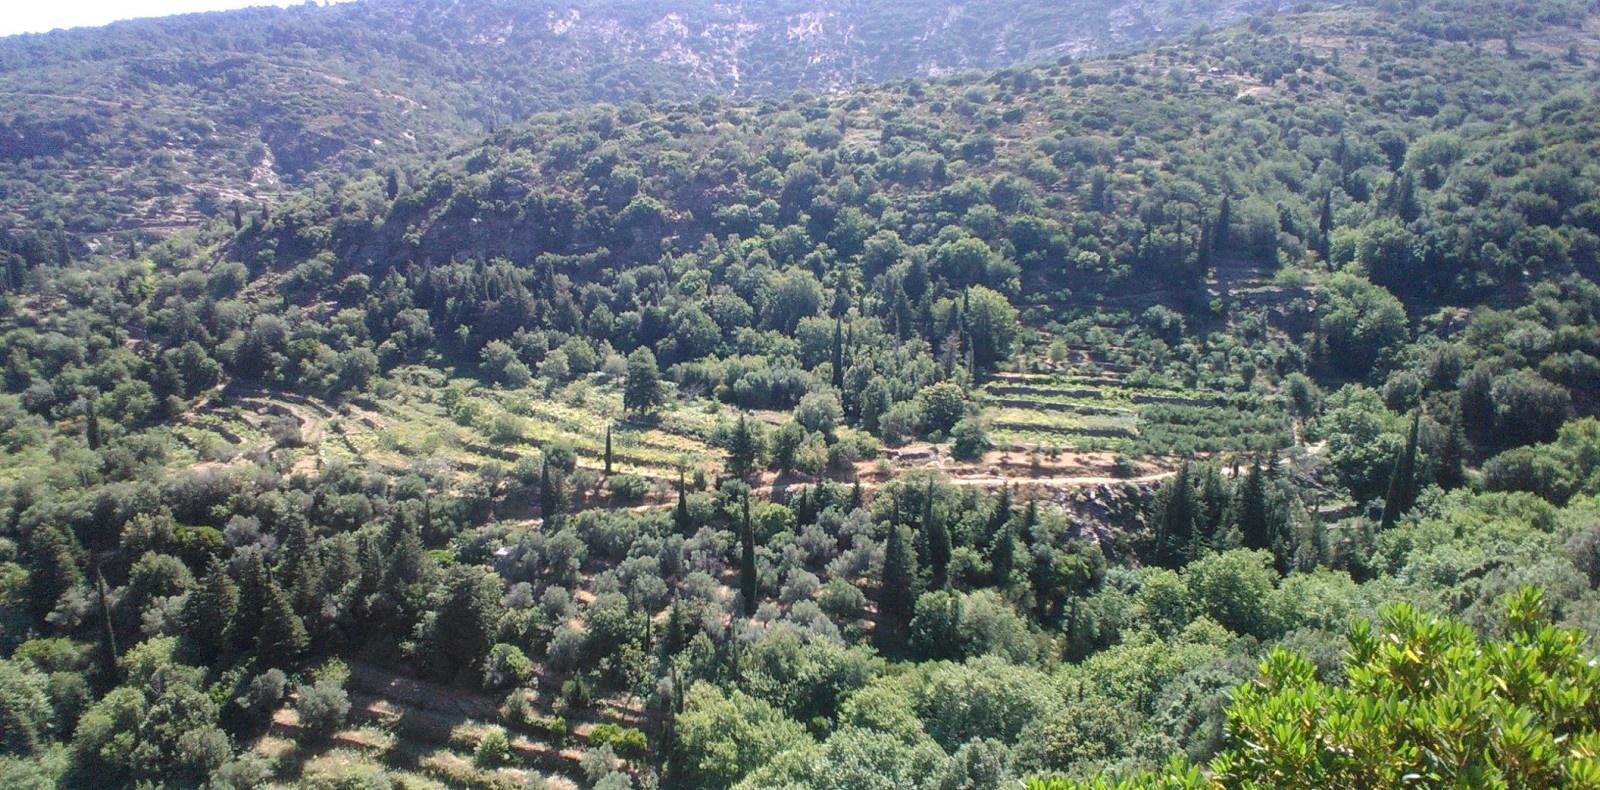 One day hikes in Arethousa, Ikaria